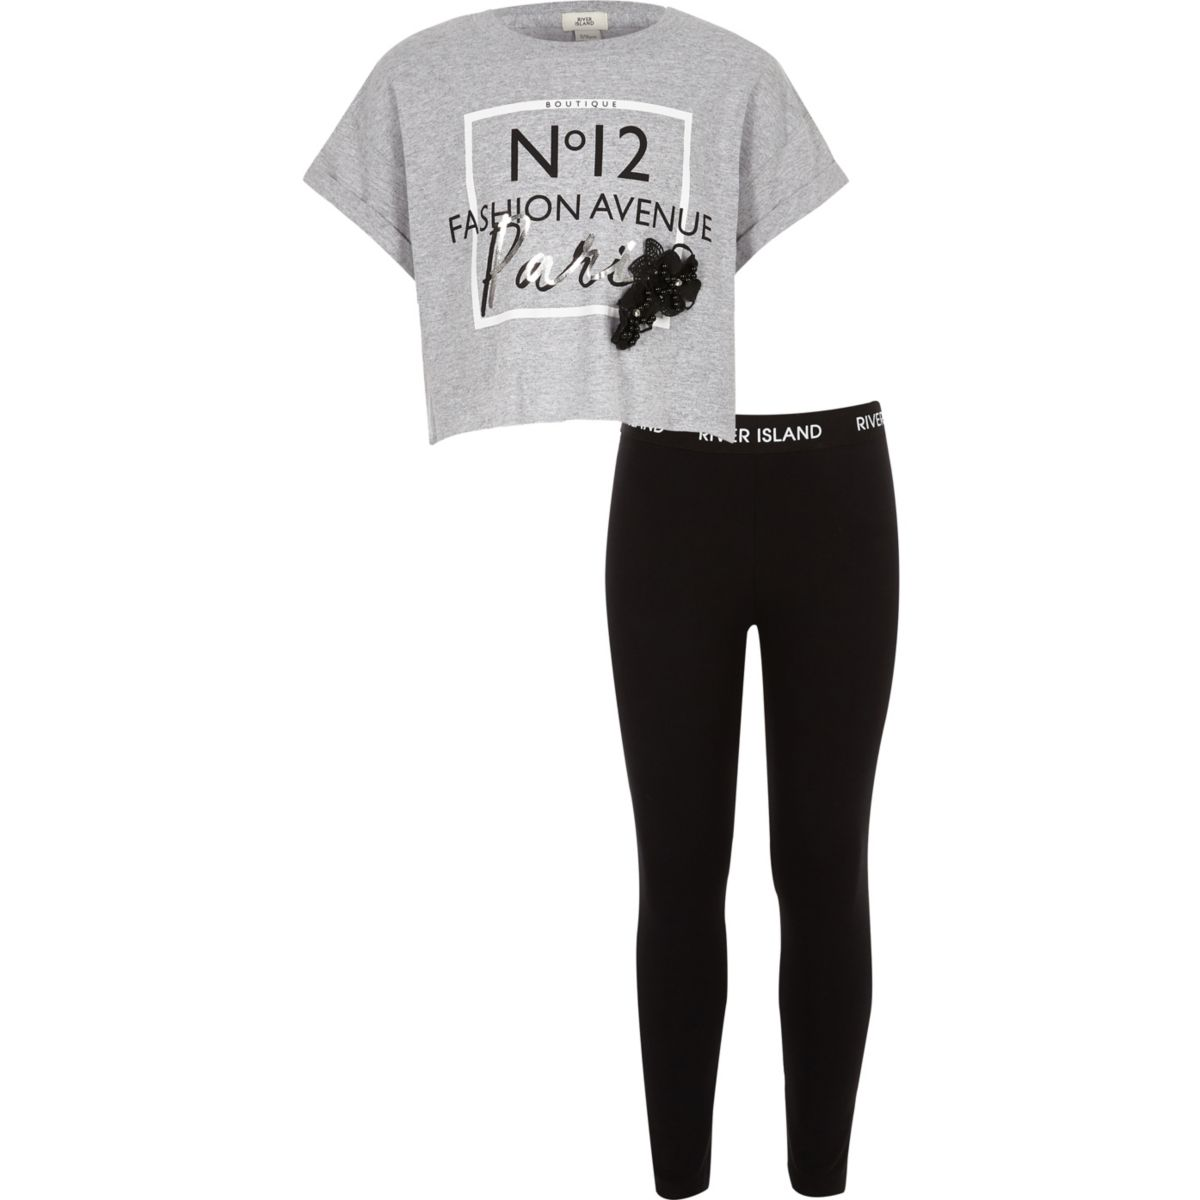 Girls grey 'Paris' T-shirt outfit